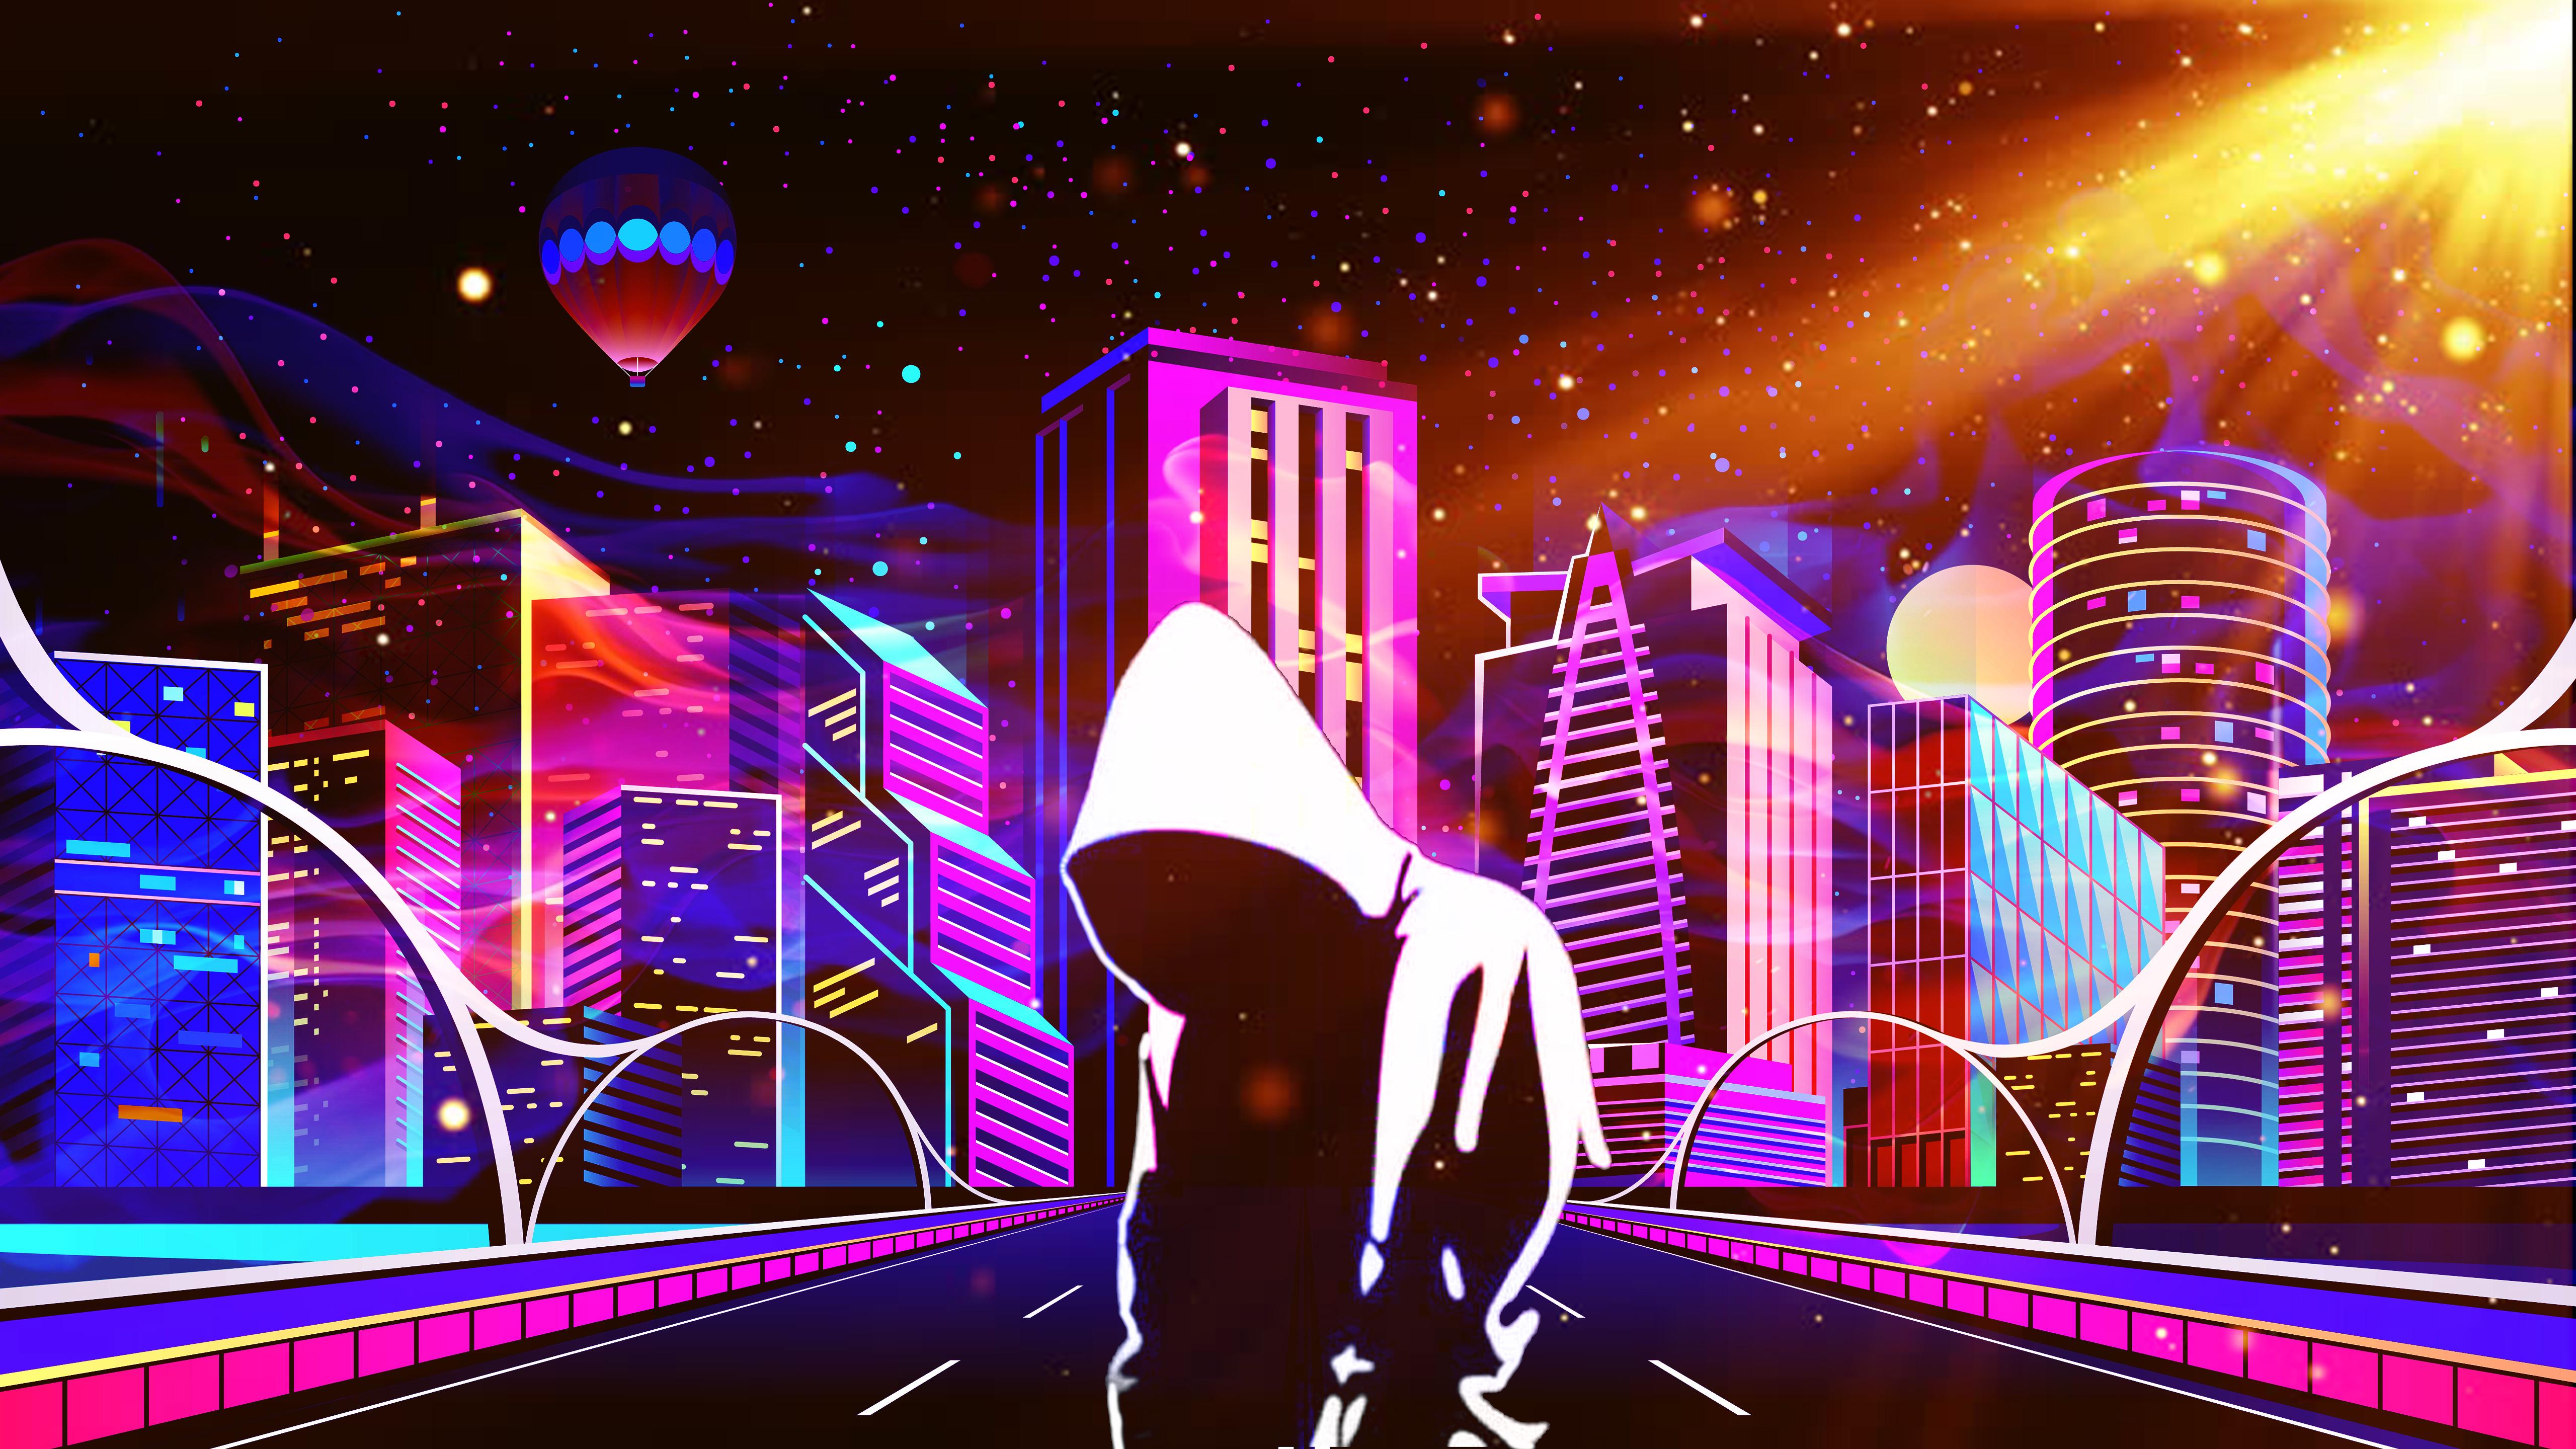 Glow Buildings Background - HD Wallpaper